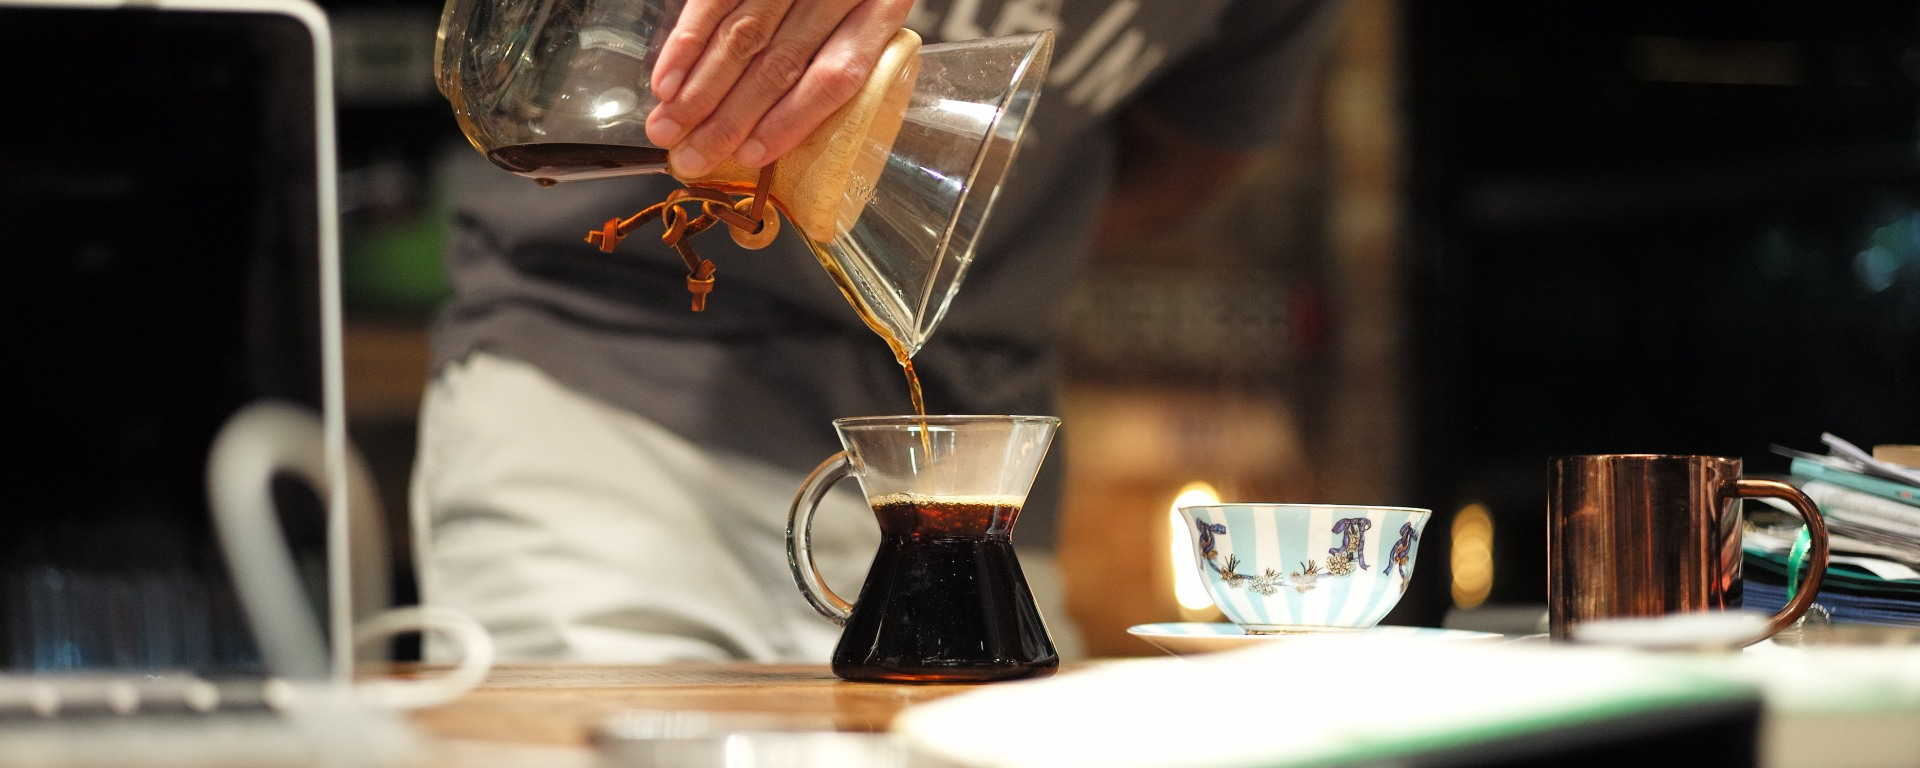 The Journeying Engineer pouring Chemex coffee to a Chemex mug